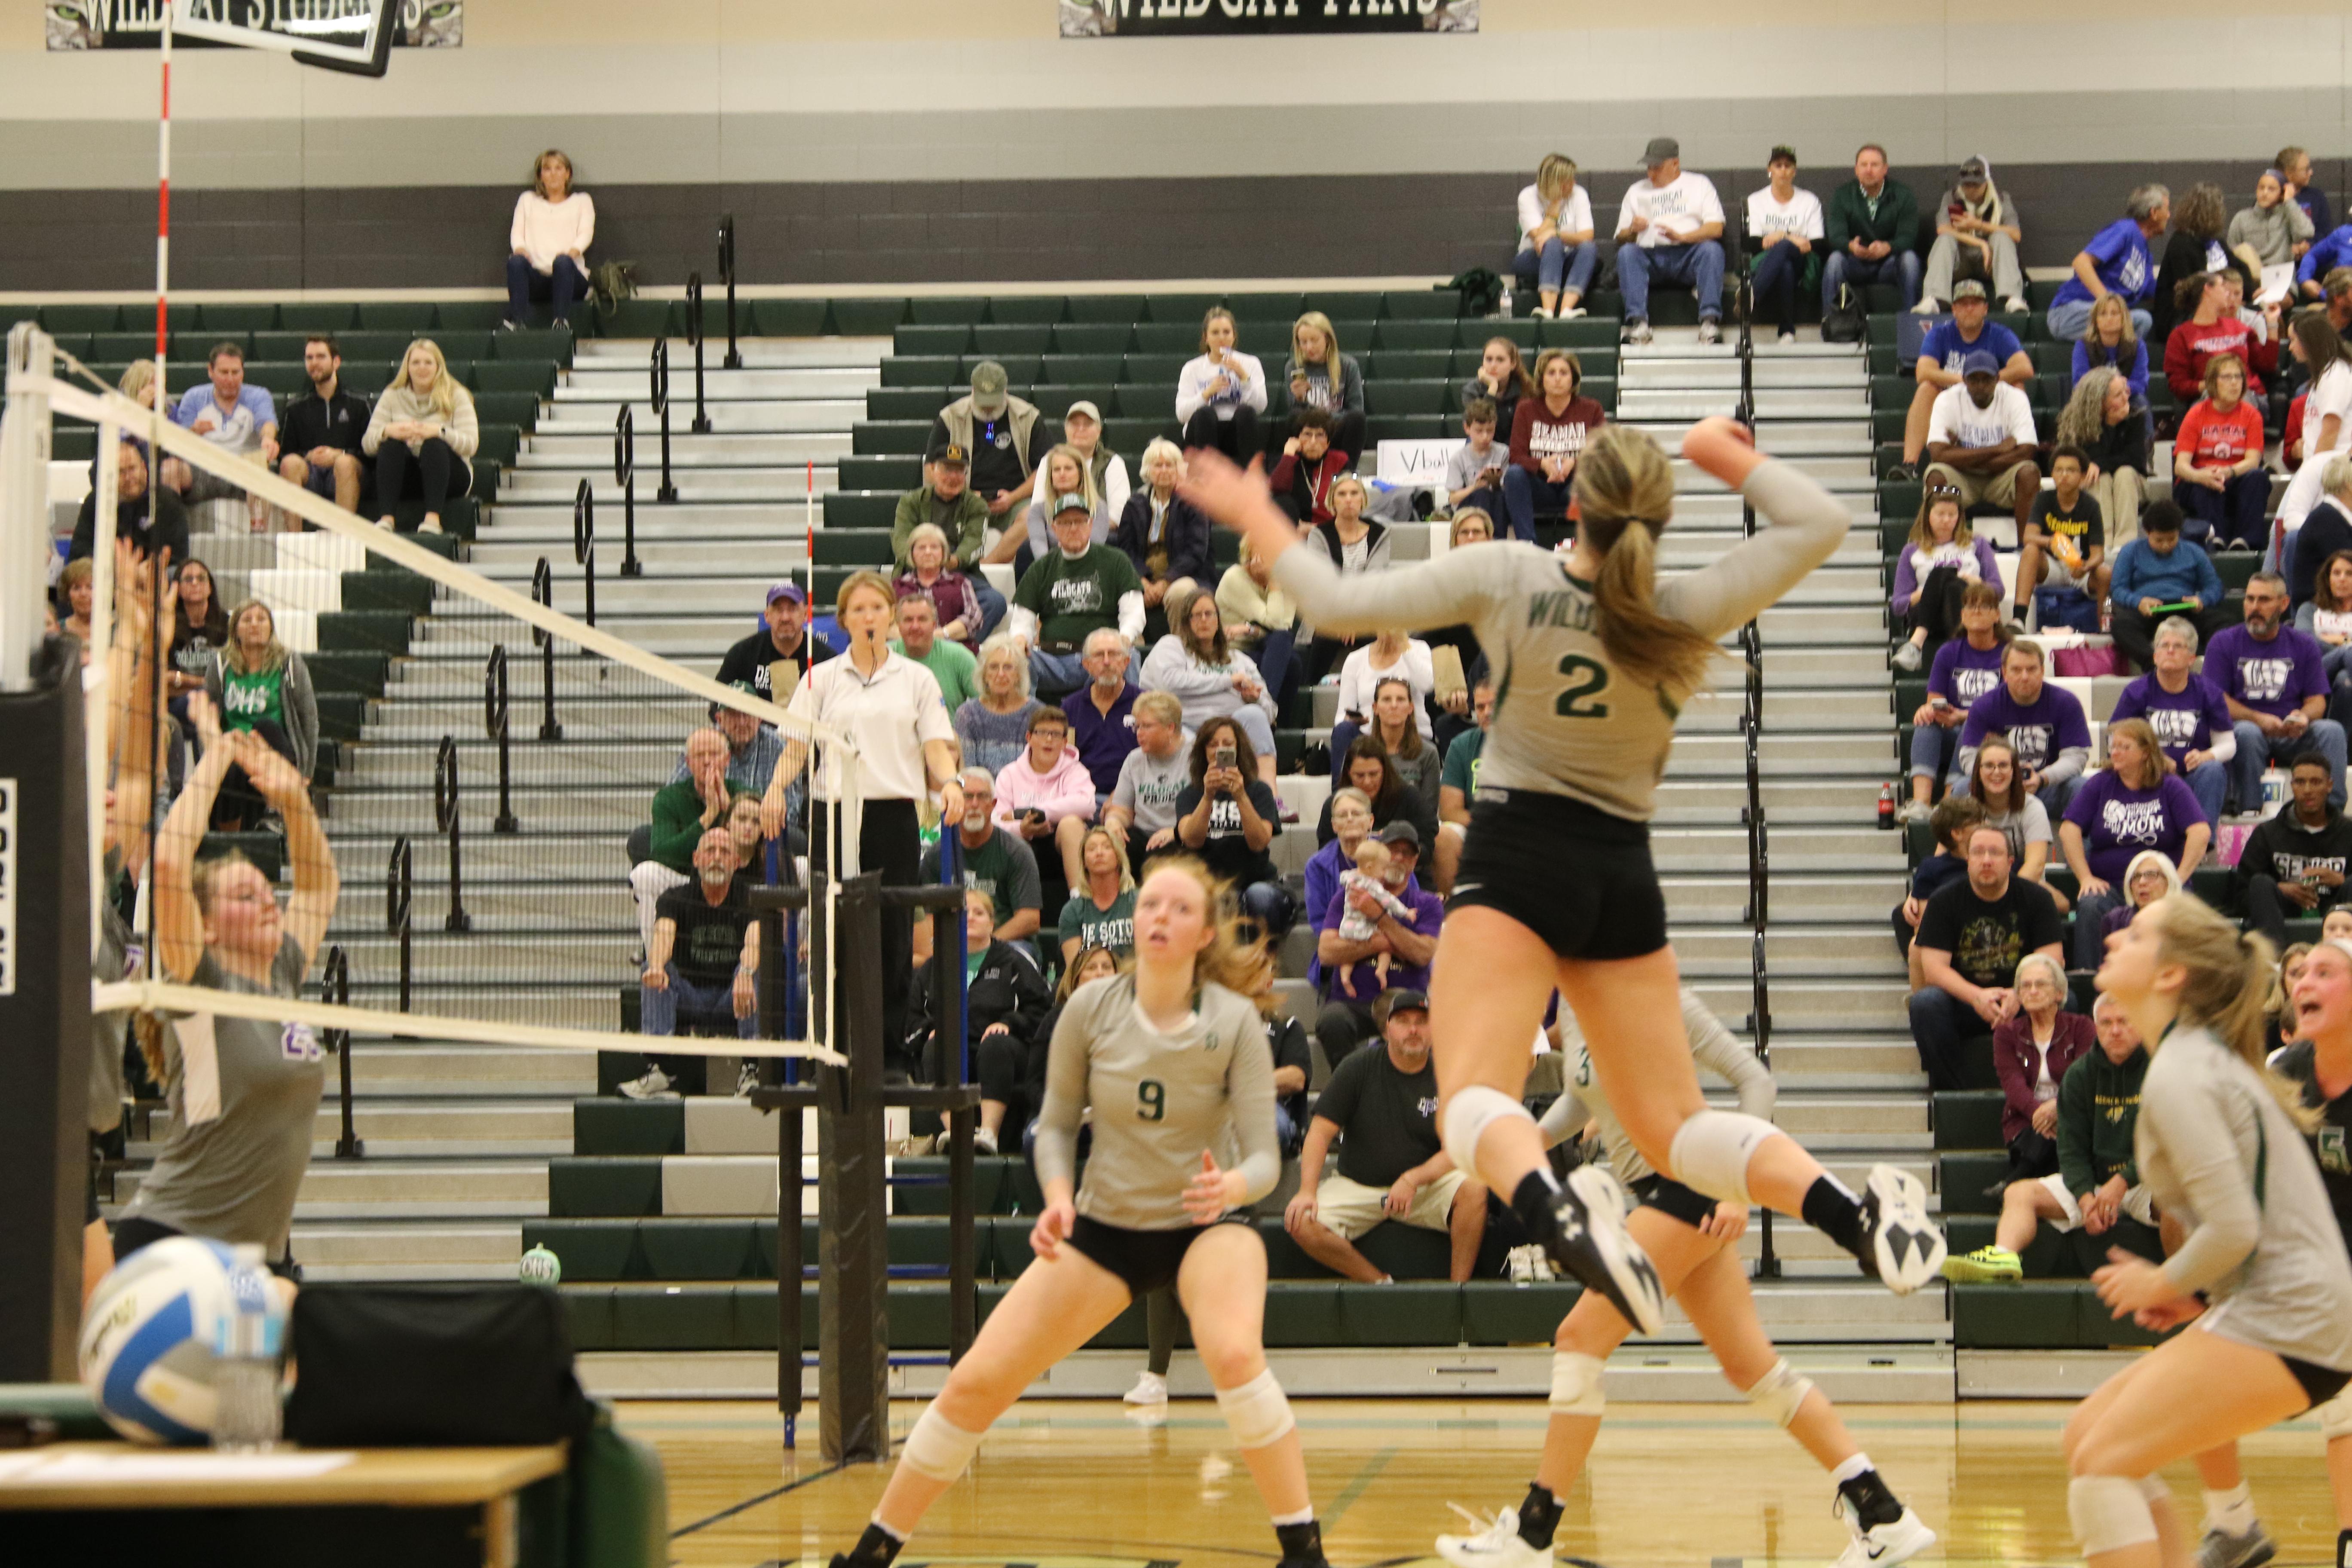 Varsity Volleyball defeats Topeka West 2-0